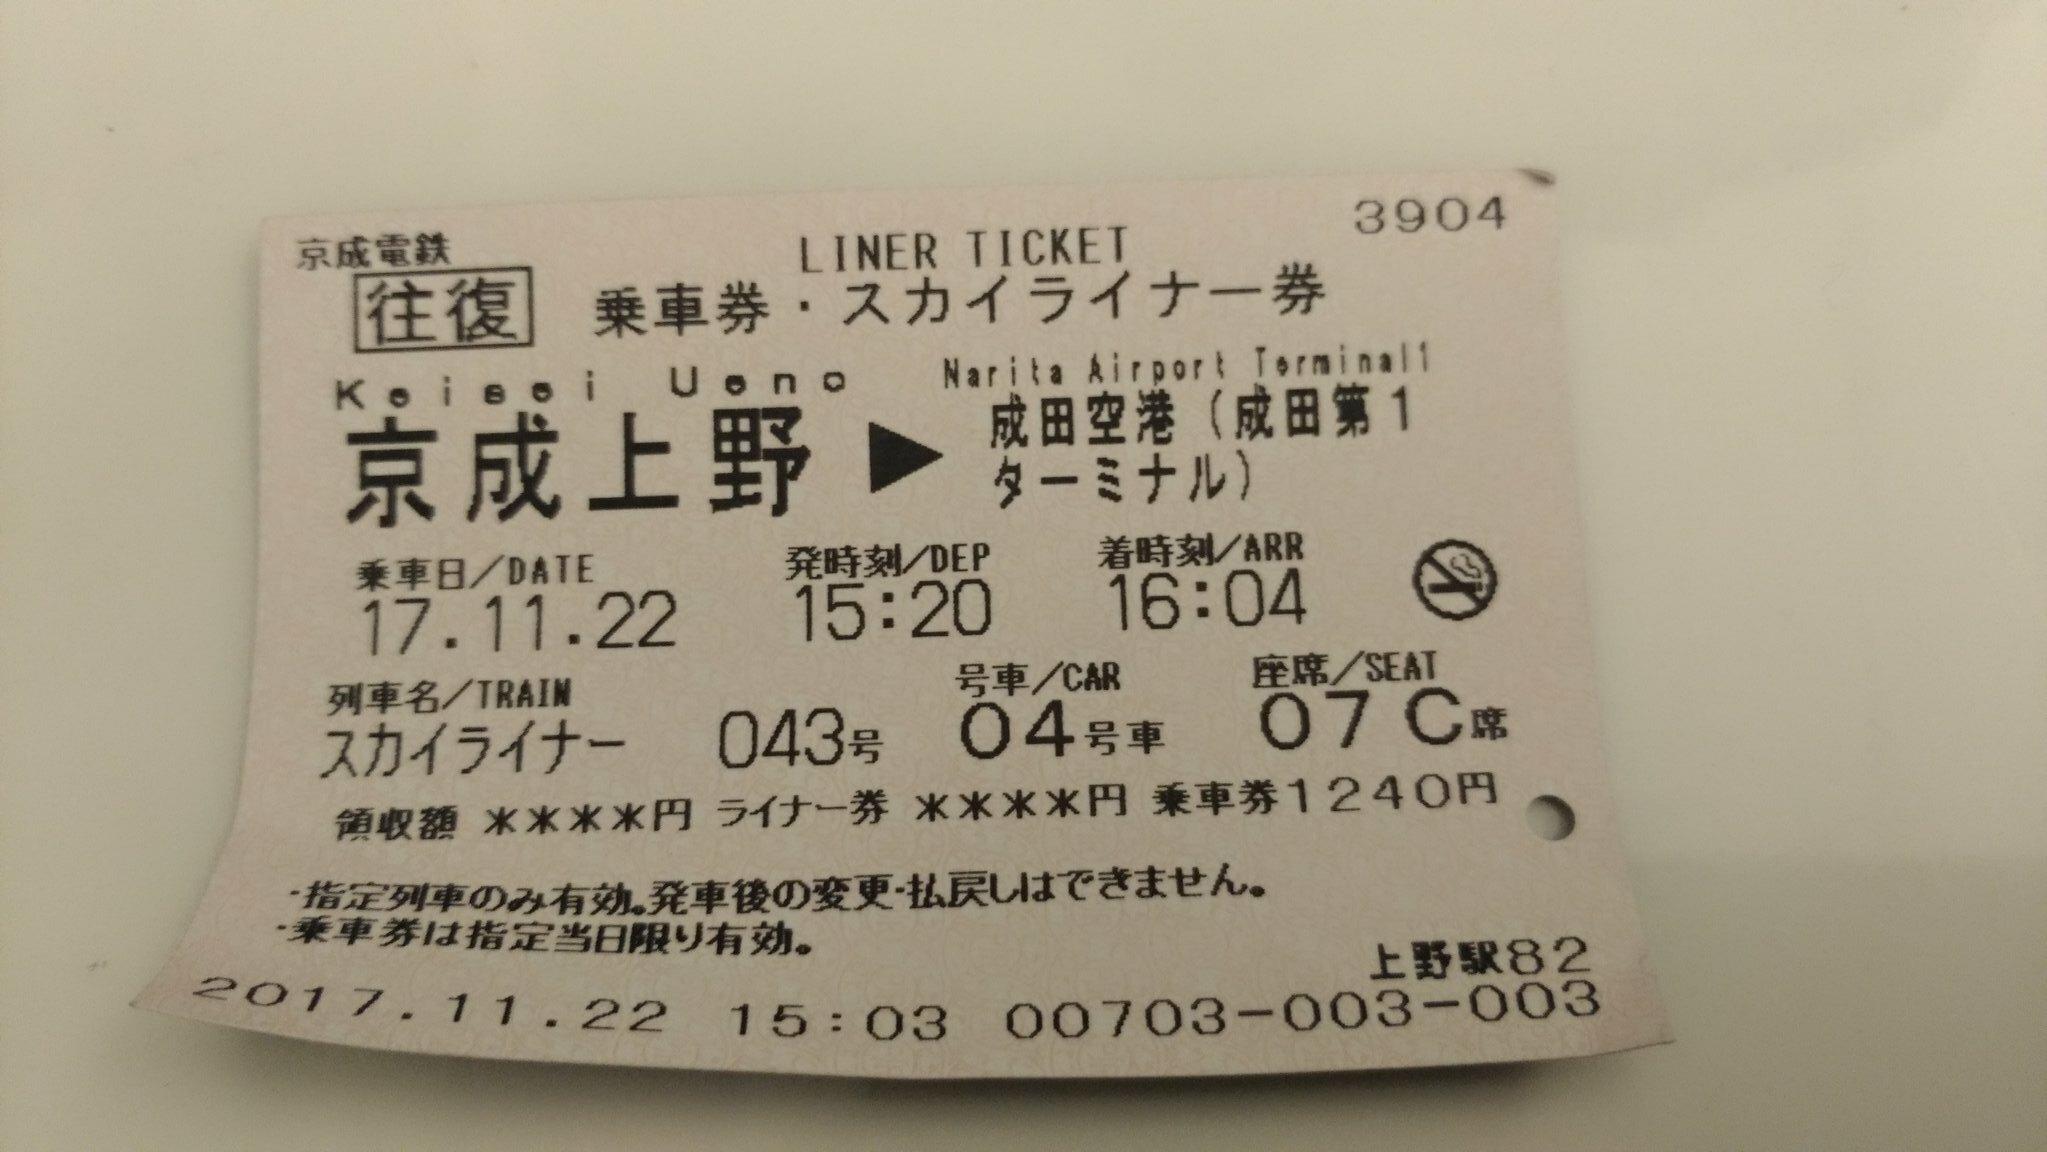 P_20171122_160315_vHDR_Auto